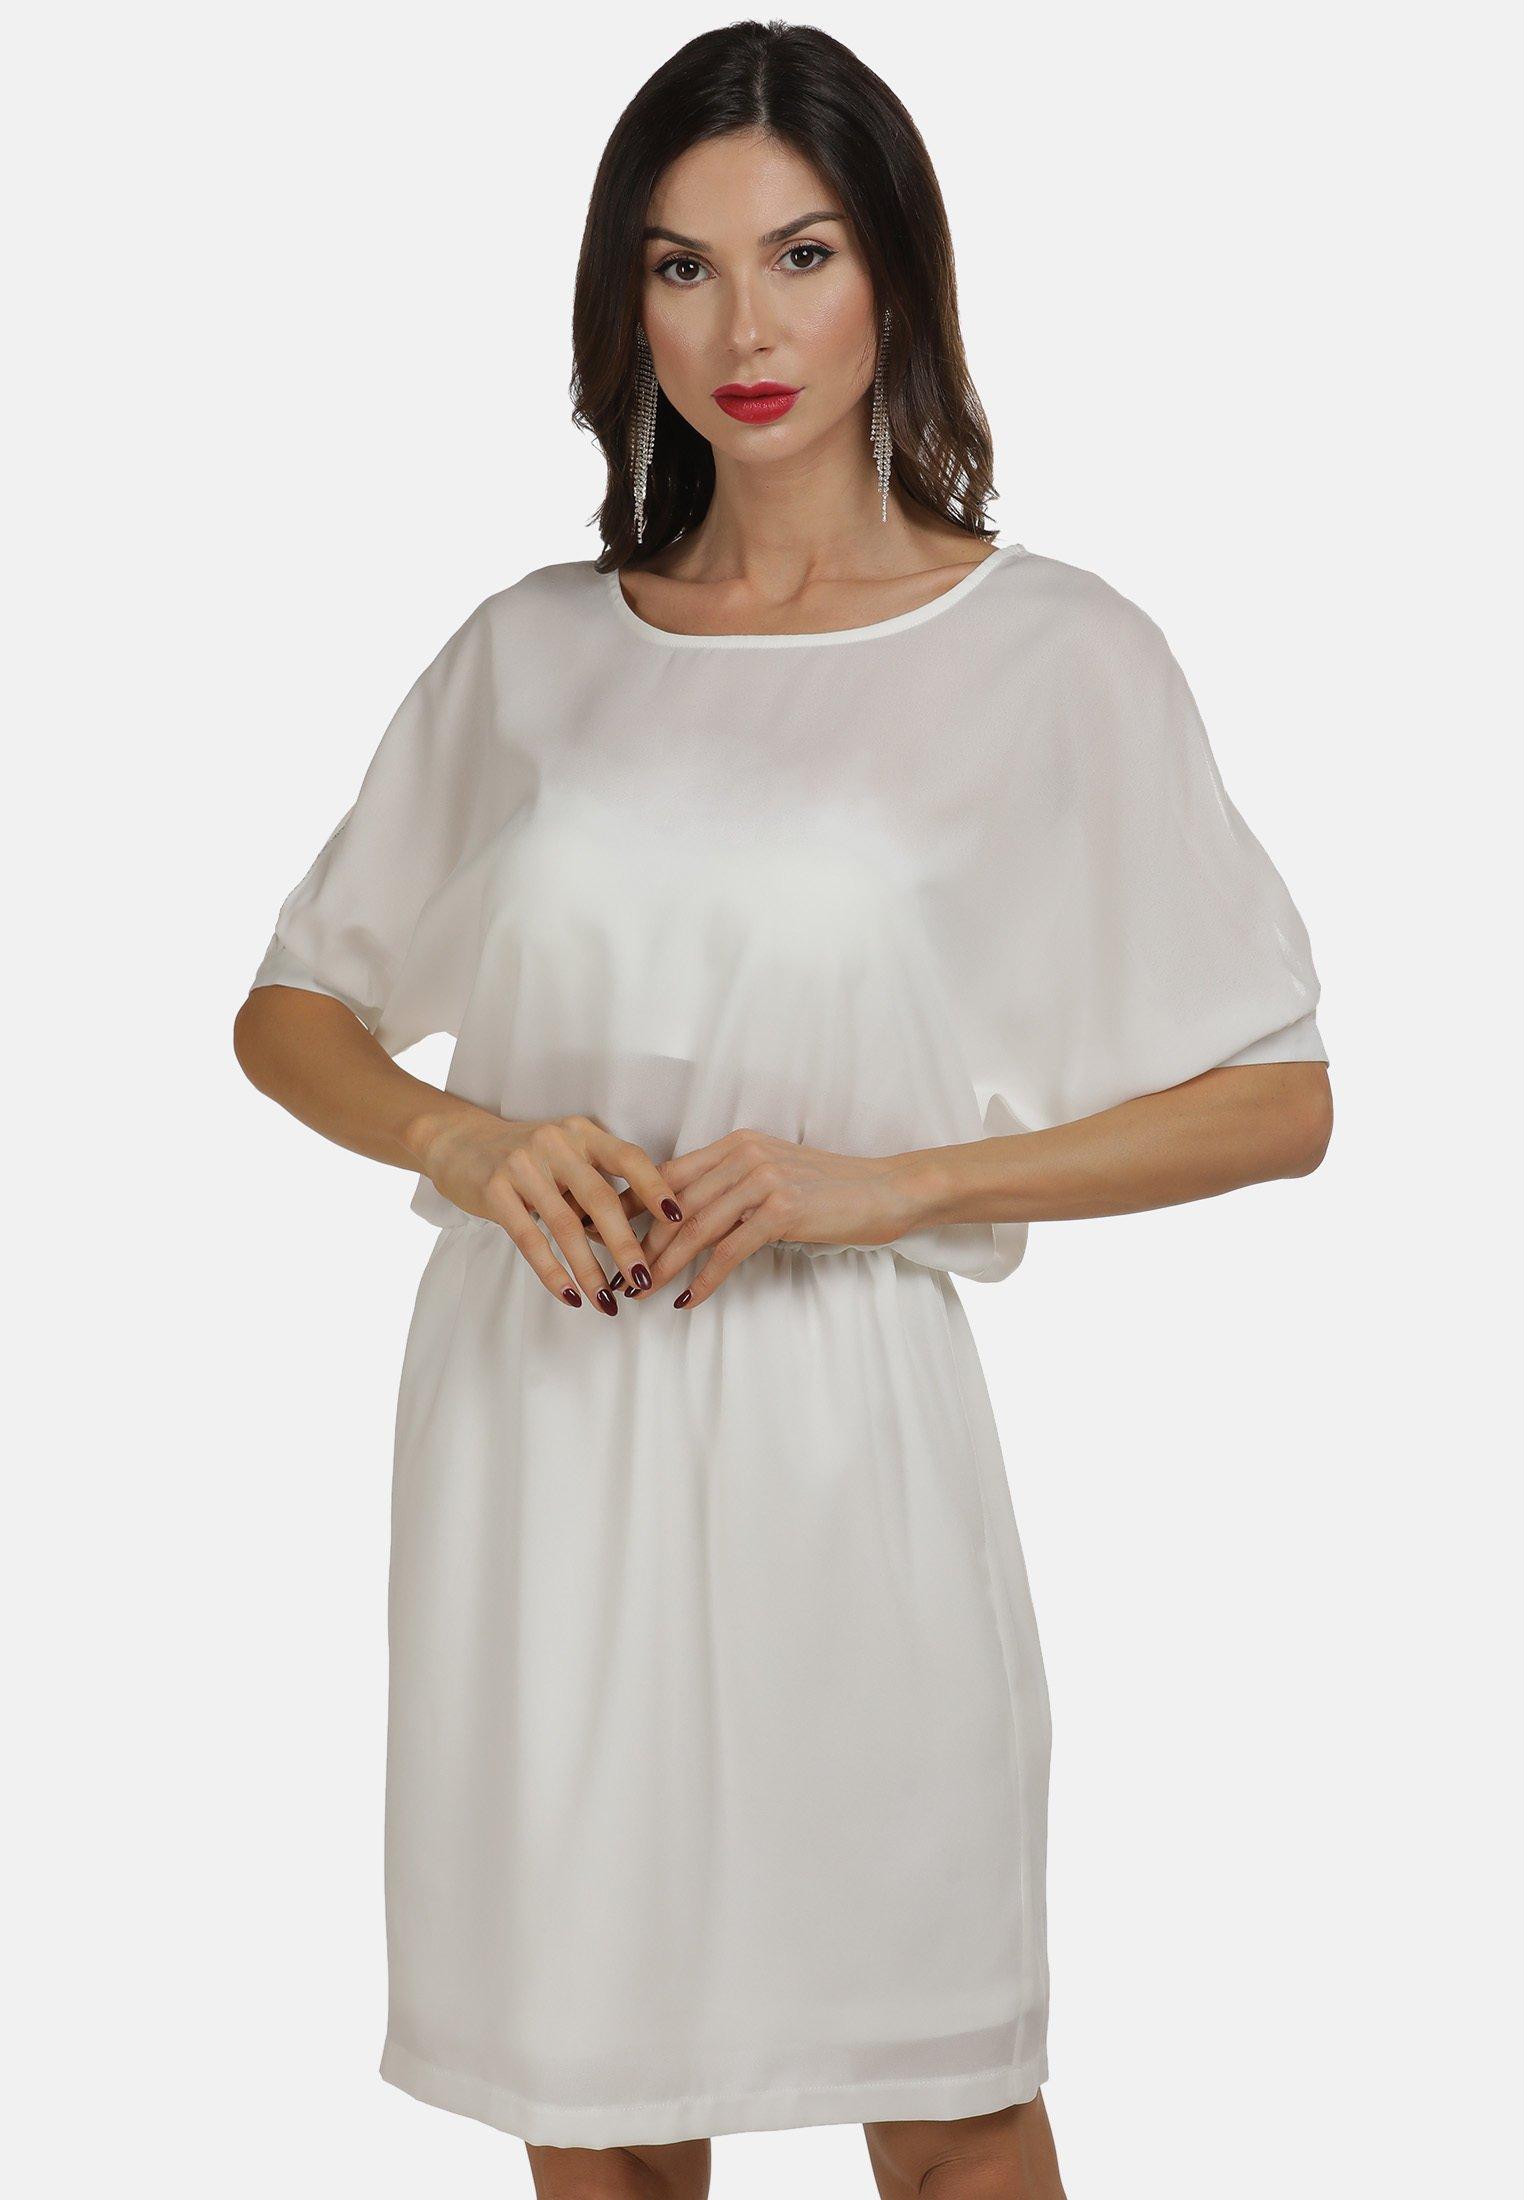 Lowest Price Women's Clothing faina Day dress wollweiss Ry5FafYx2